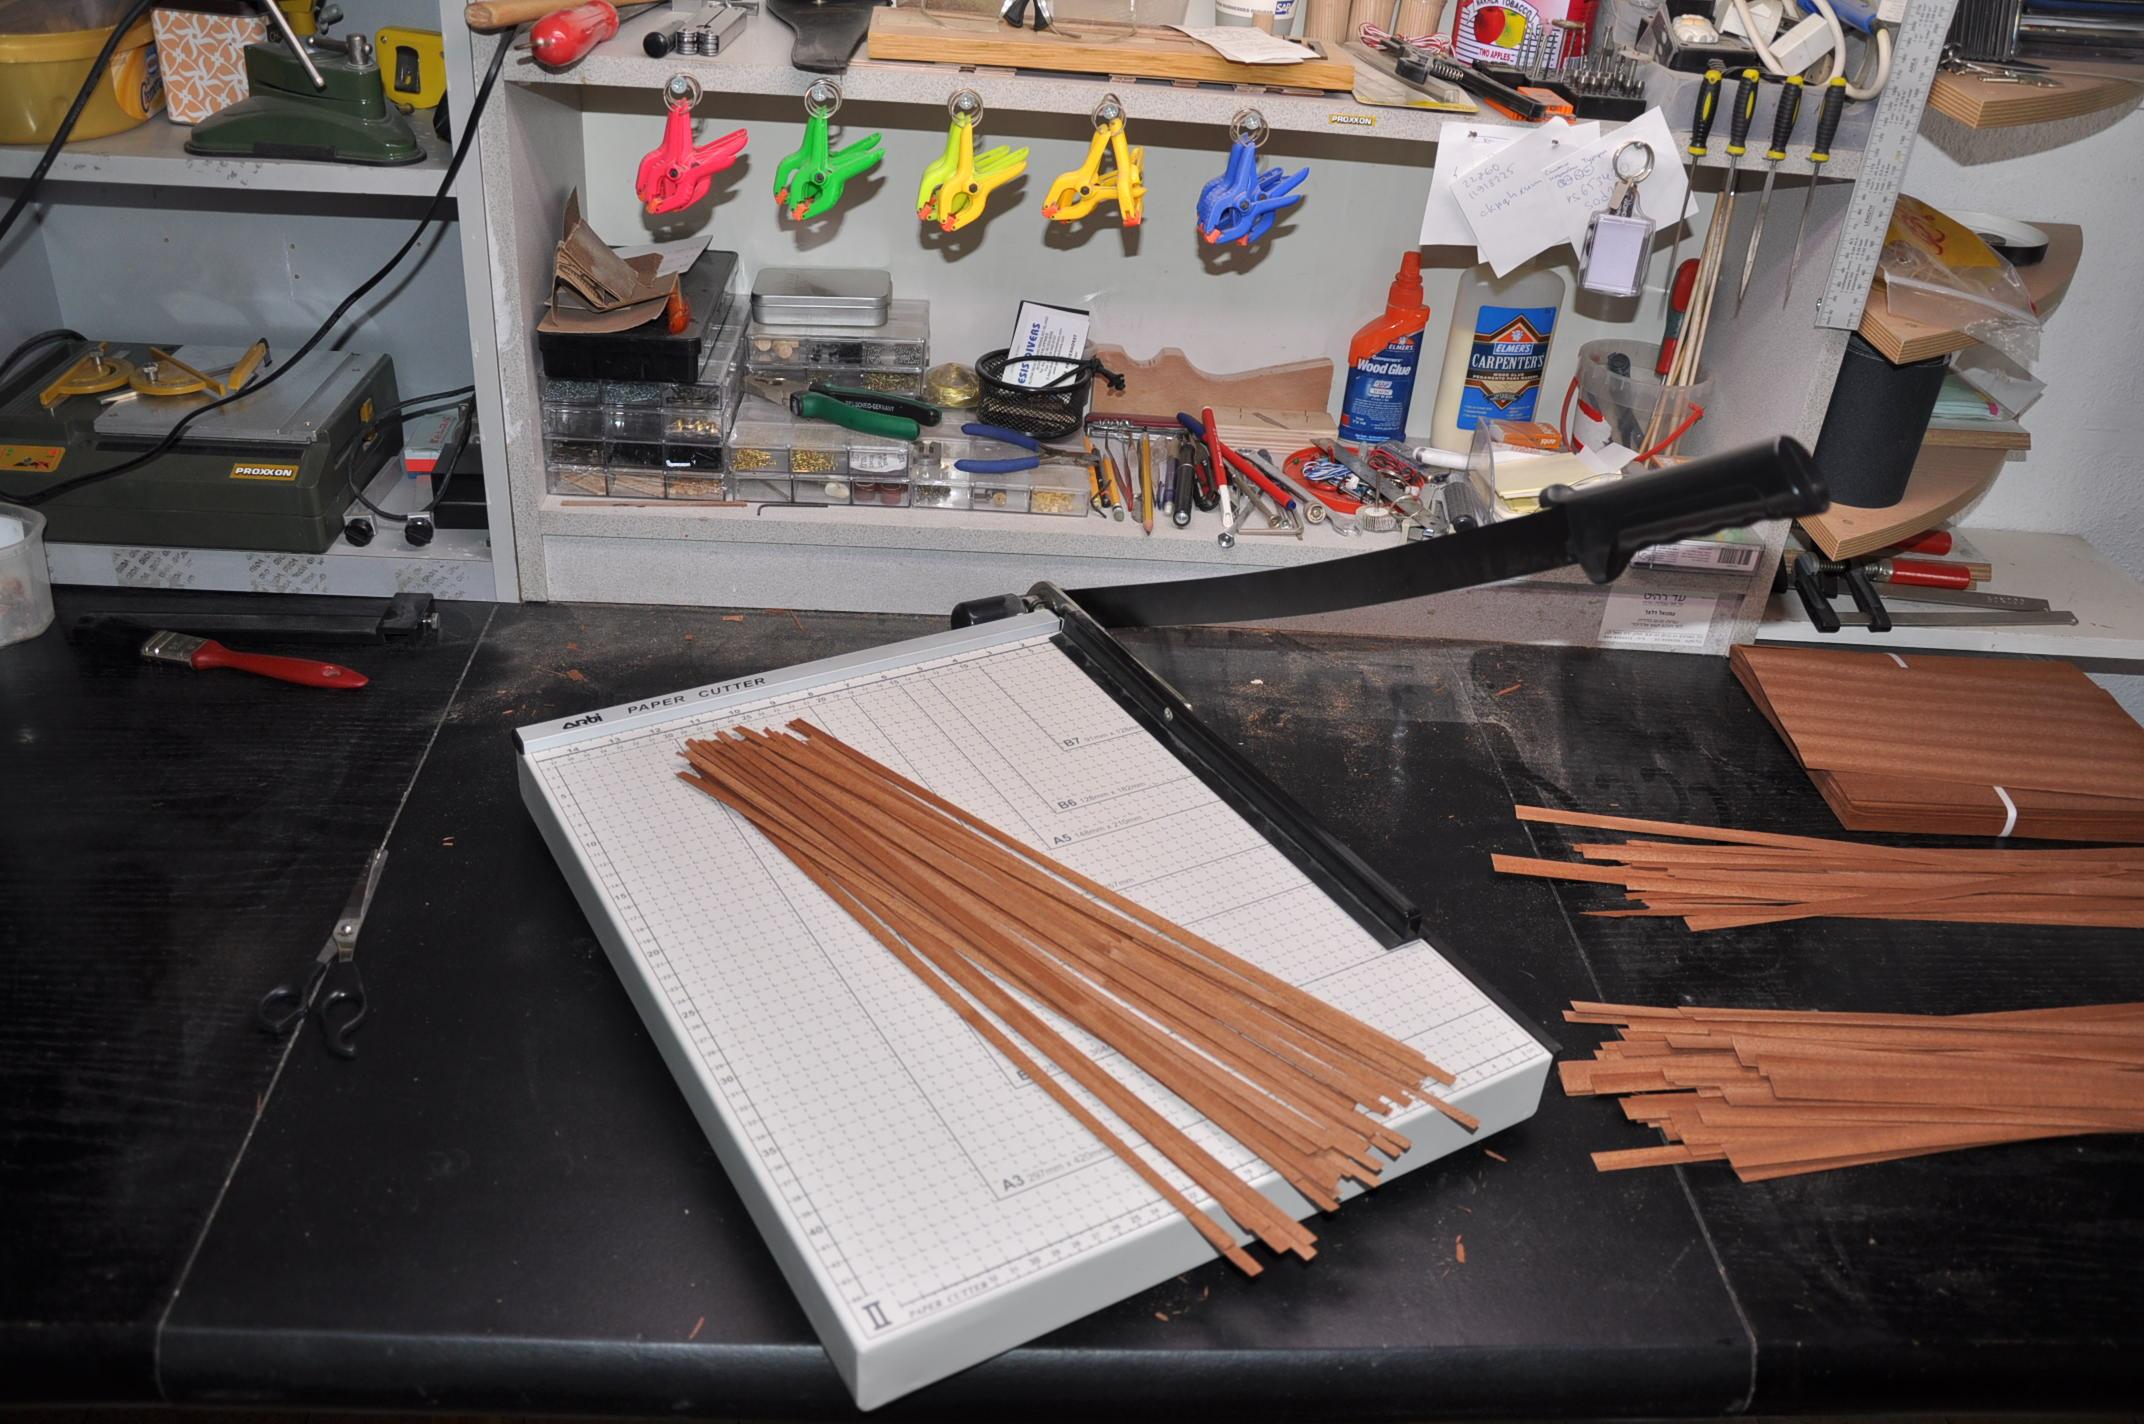 Гильотина для резки бумаги в астане